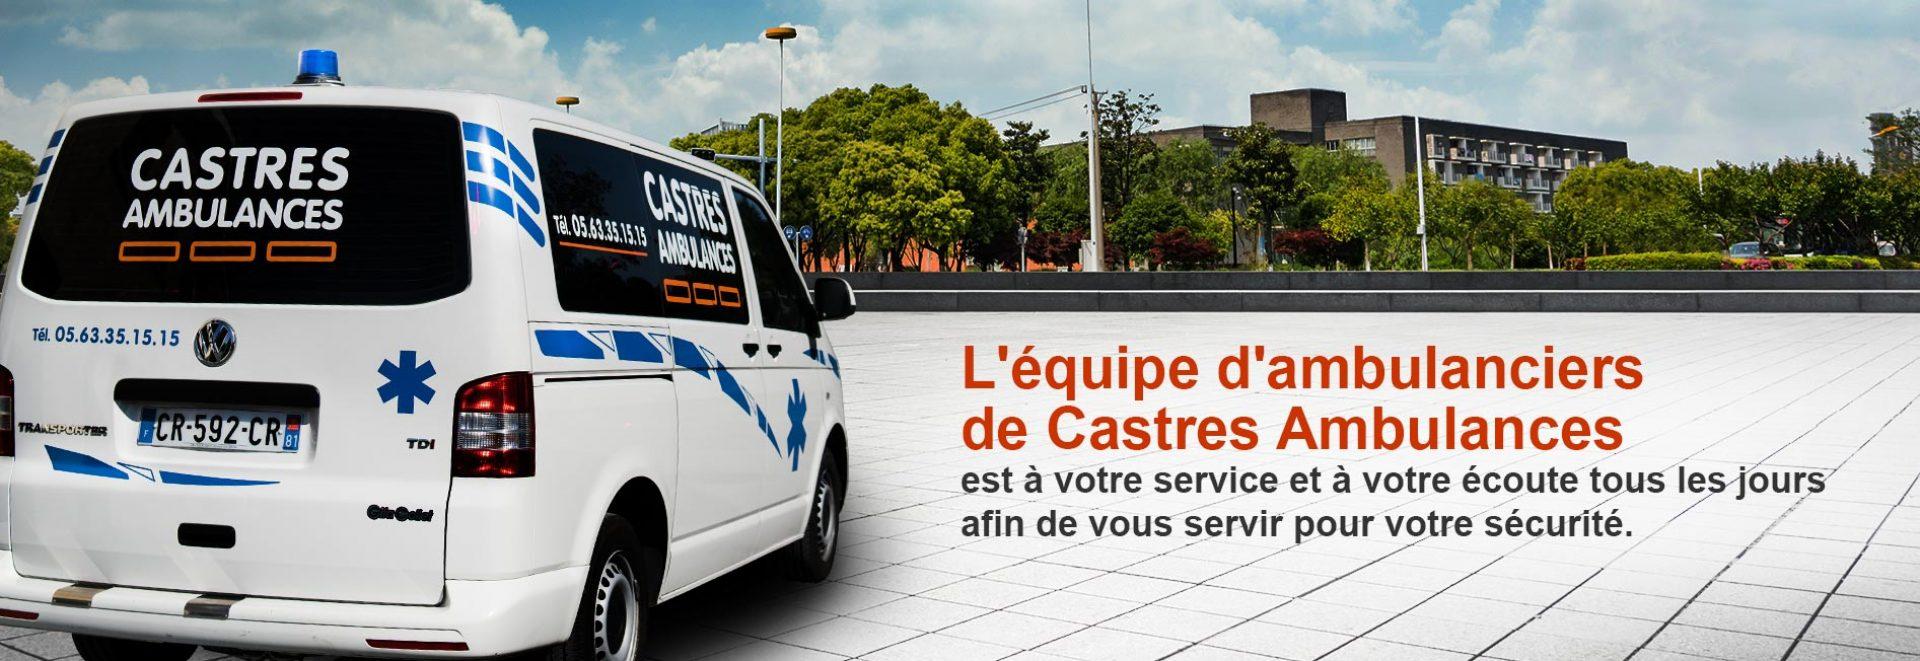 illustration-castres-ambulances-06